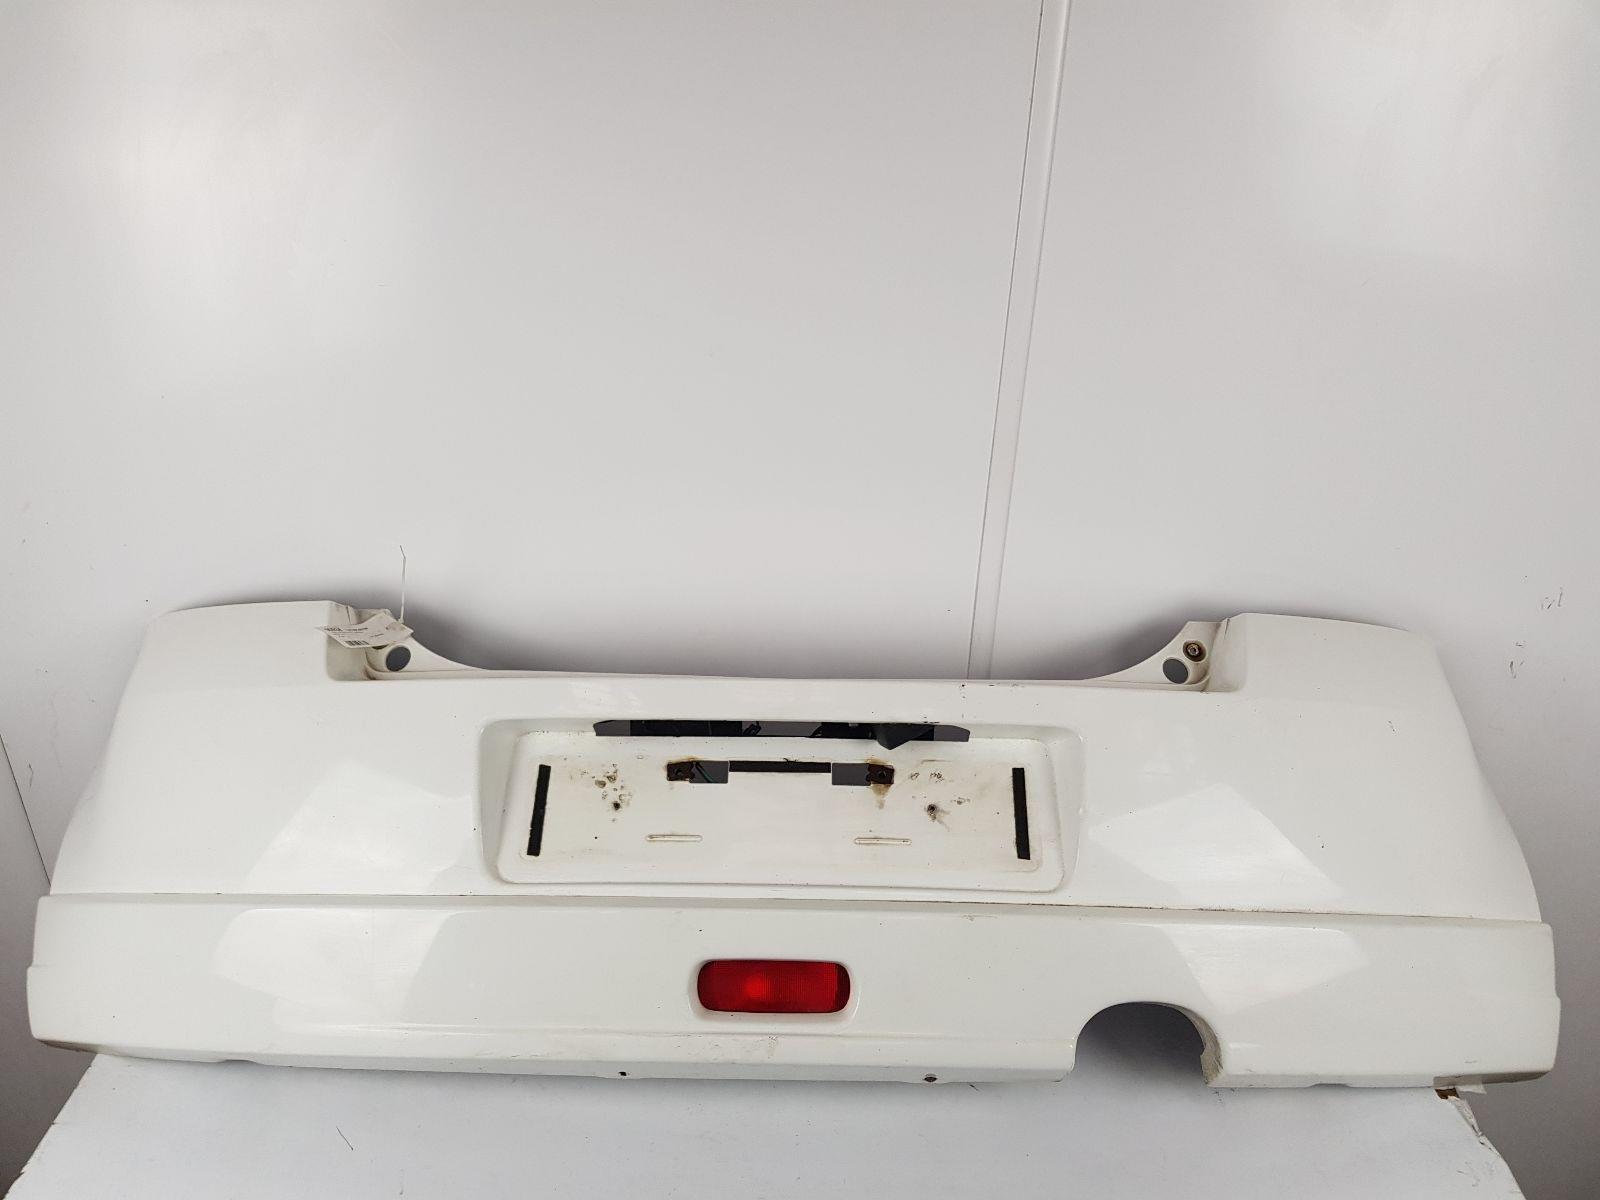 Suzuki Swift 2005 To 2010 Bumper Rear (Diesel / Manual) for